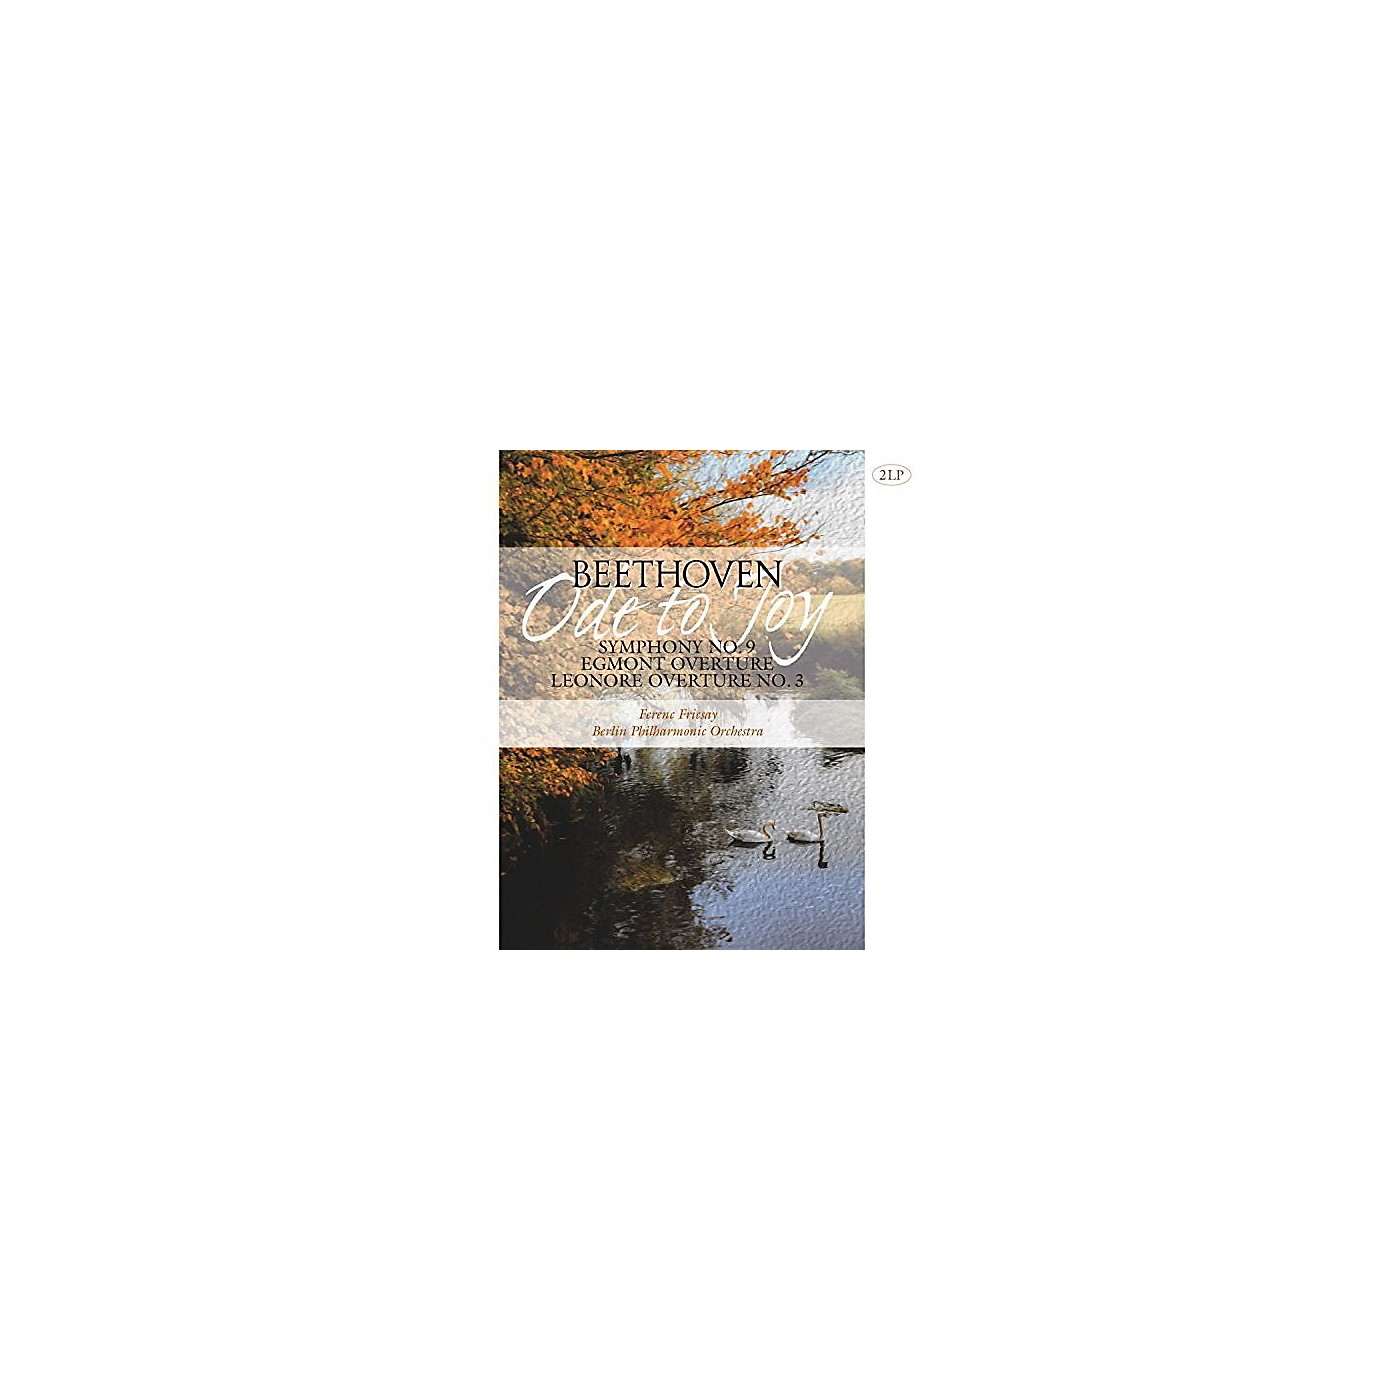 Alliance Ludwig van Beethoven - Symphony 9 / Egmont Overture / Leonore Overture 3 thumbnail